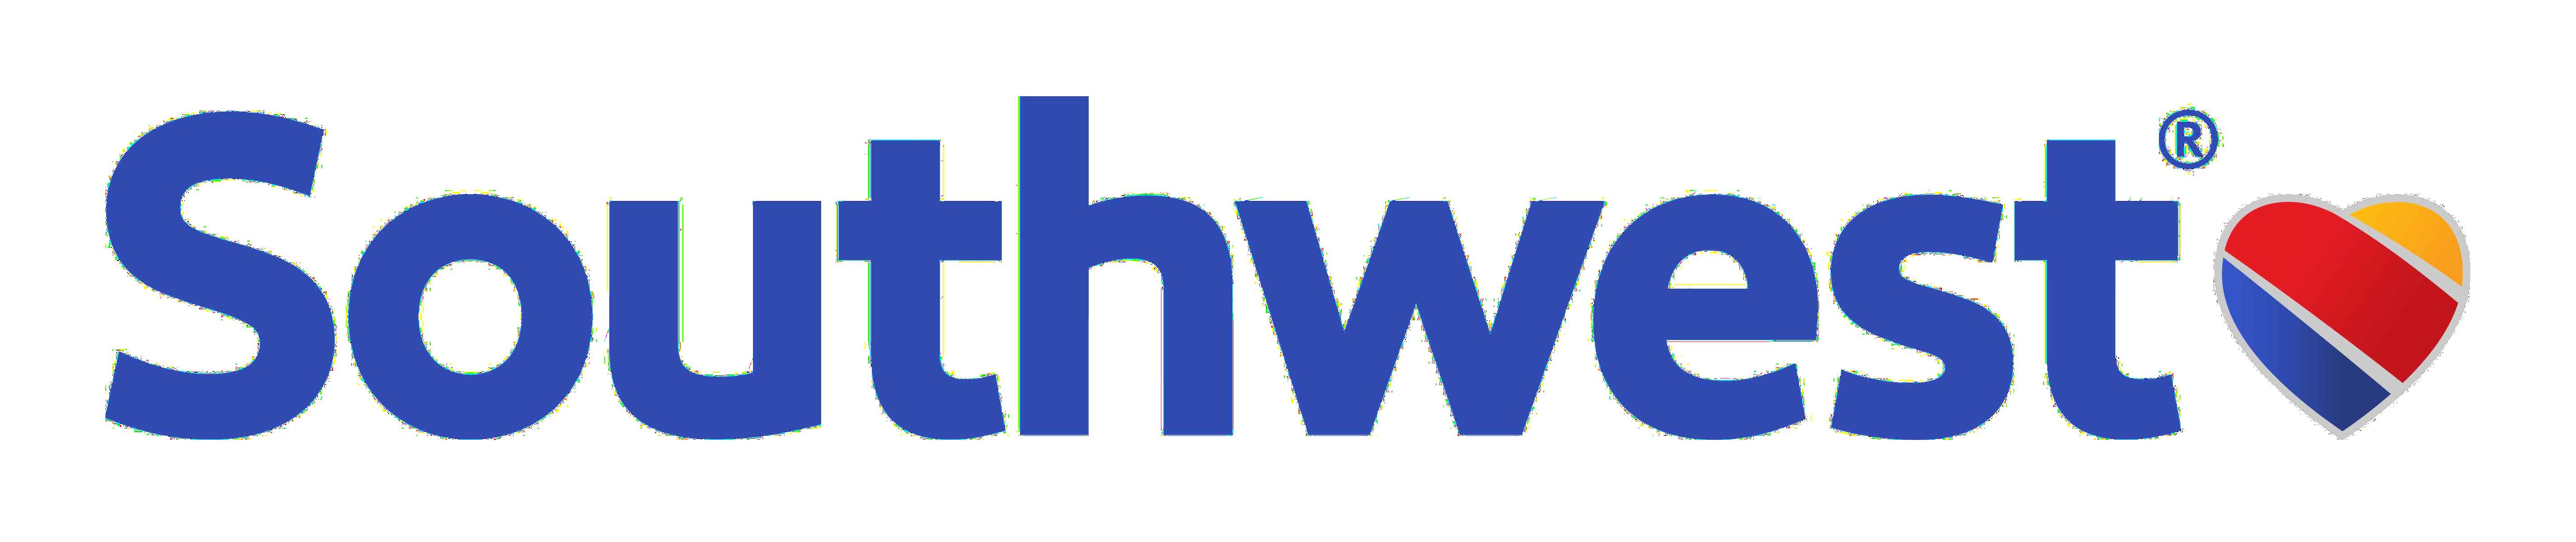 PNGPIX-COM-Southwest-Airlines-Logo-PNG-Transparent